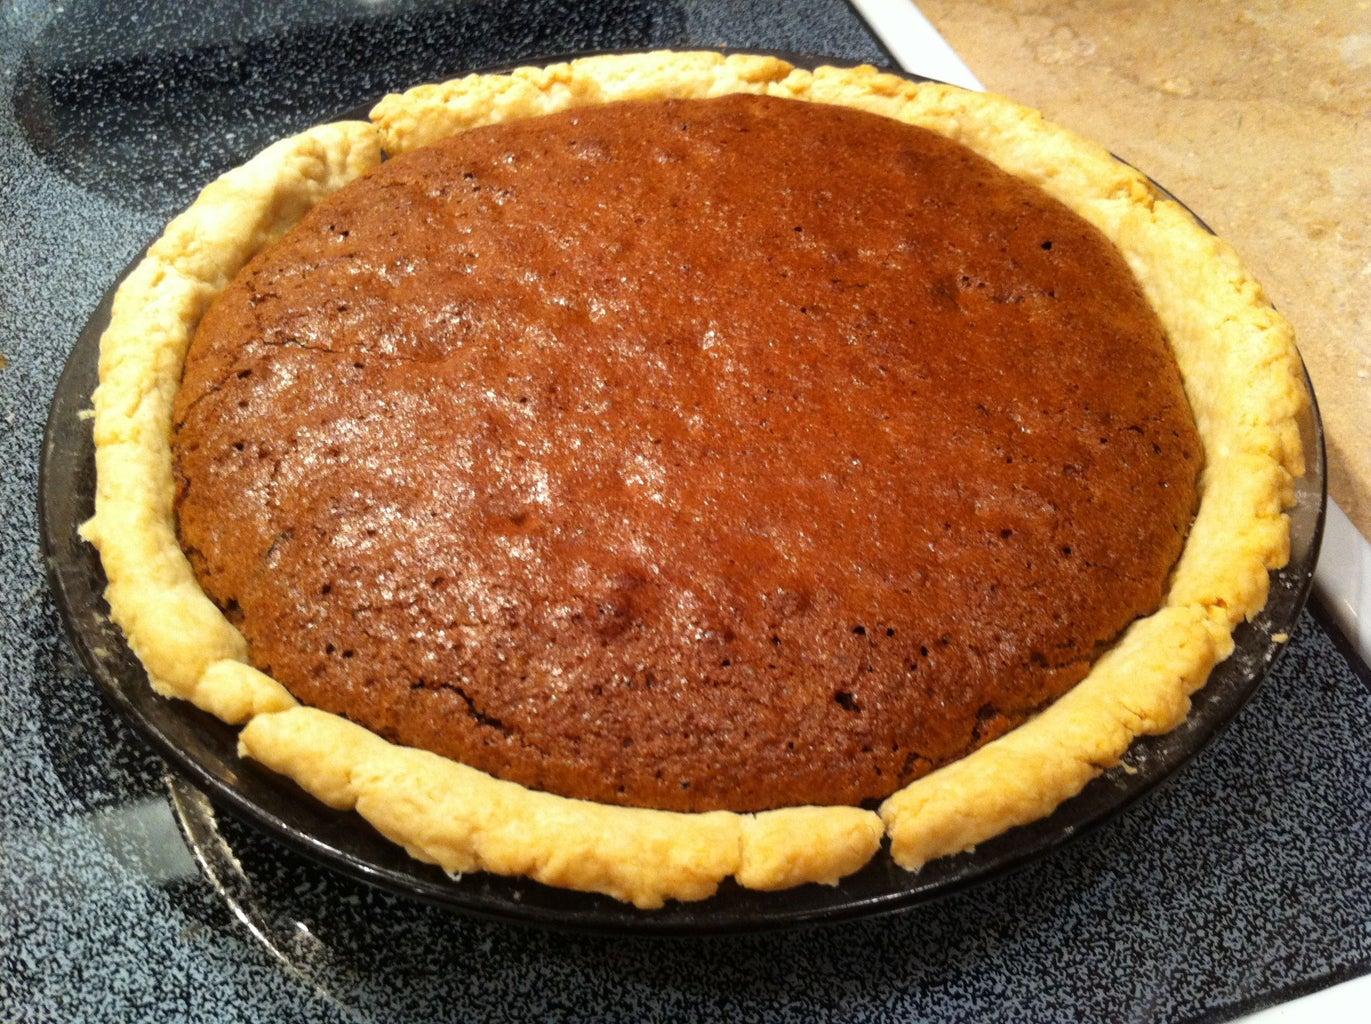 Enjoy the Pie